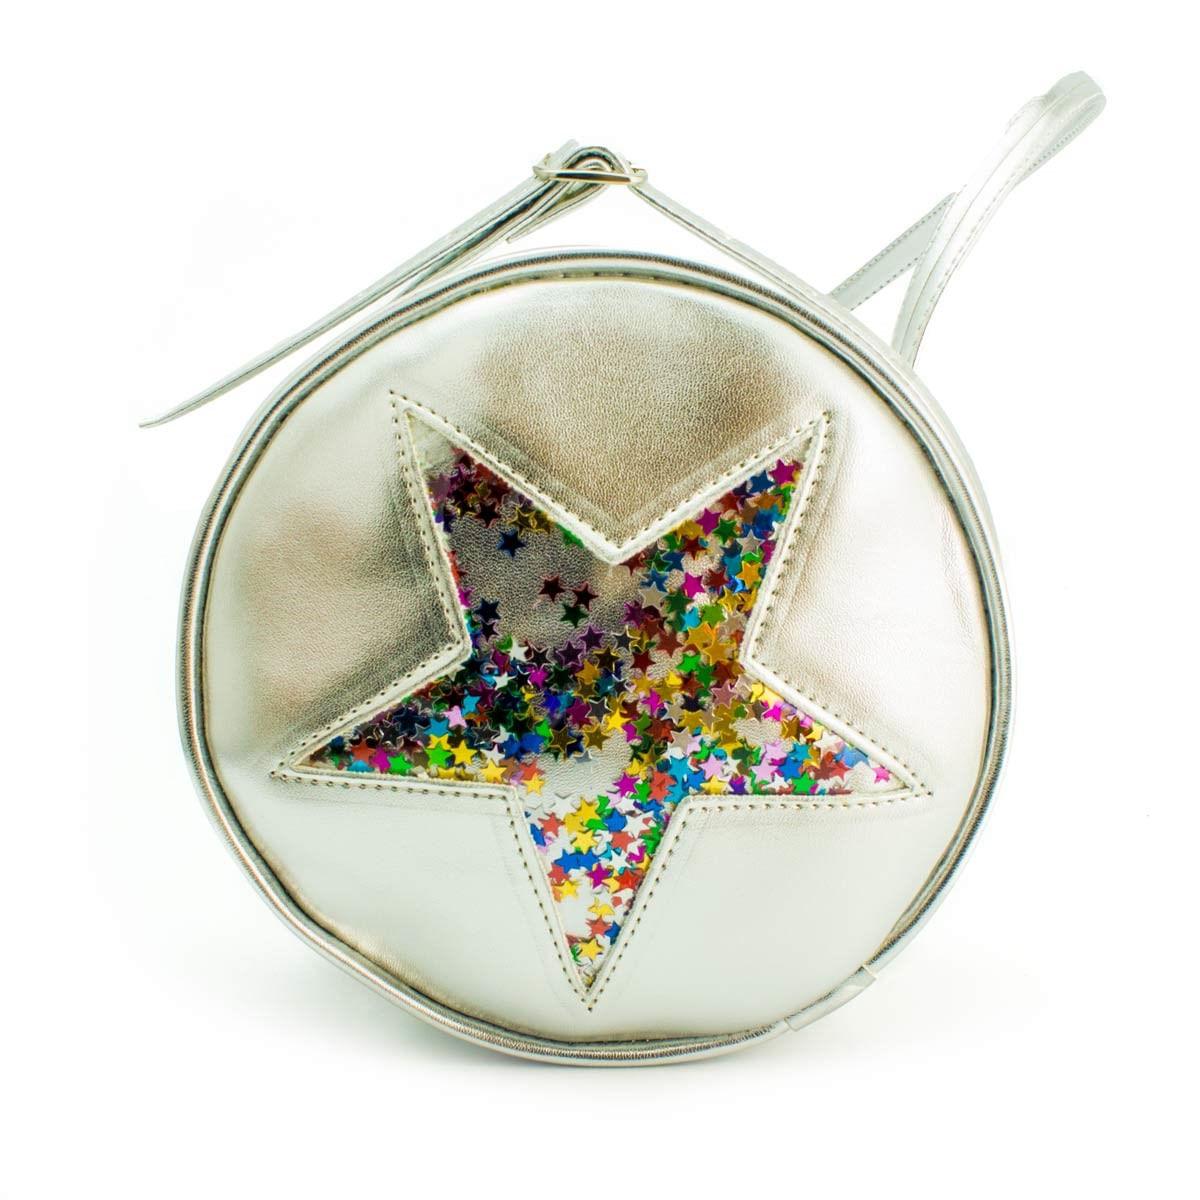 Bolsa-Infantiln-com-estrela-vinil-Ludique-et-Badin